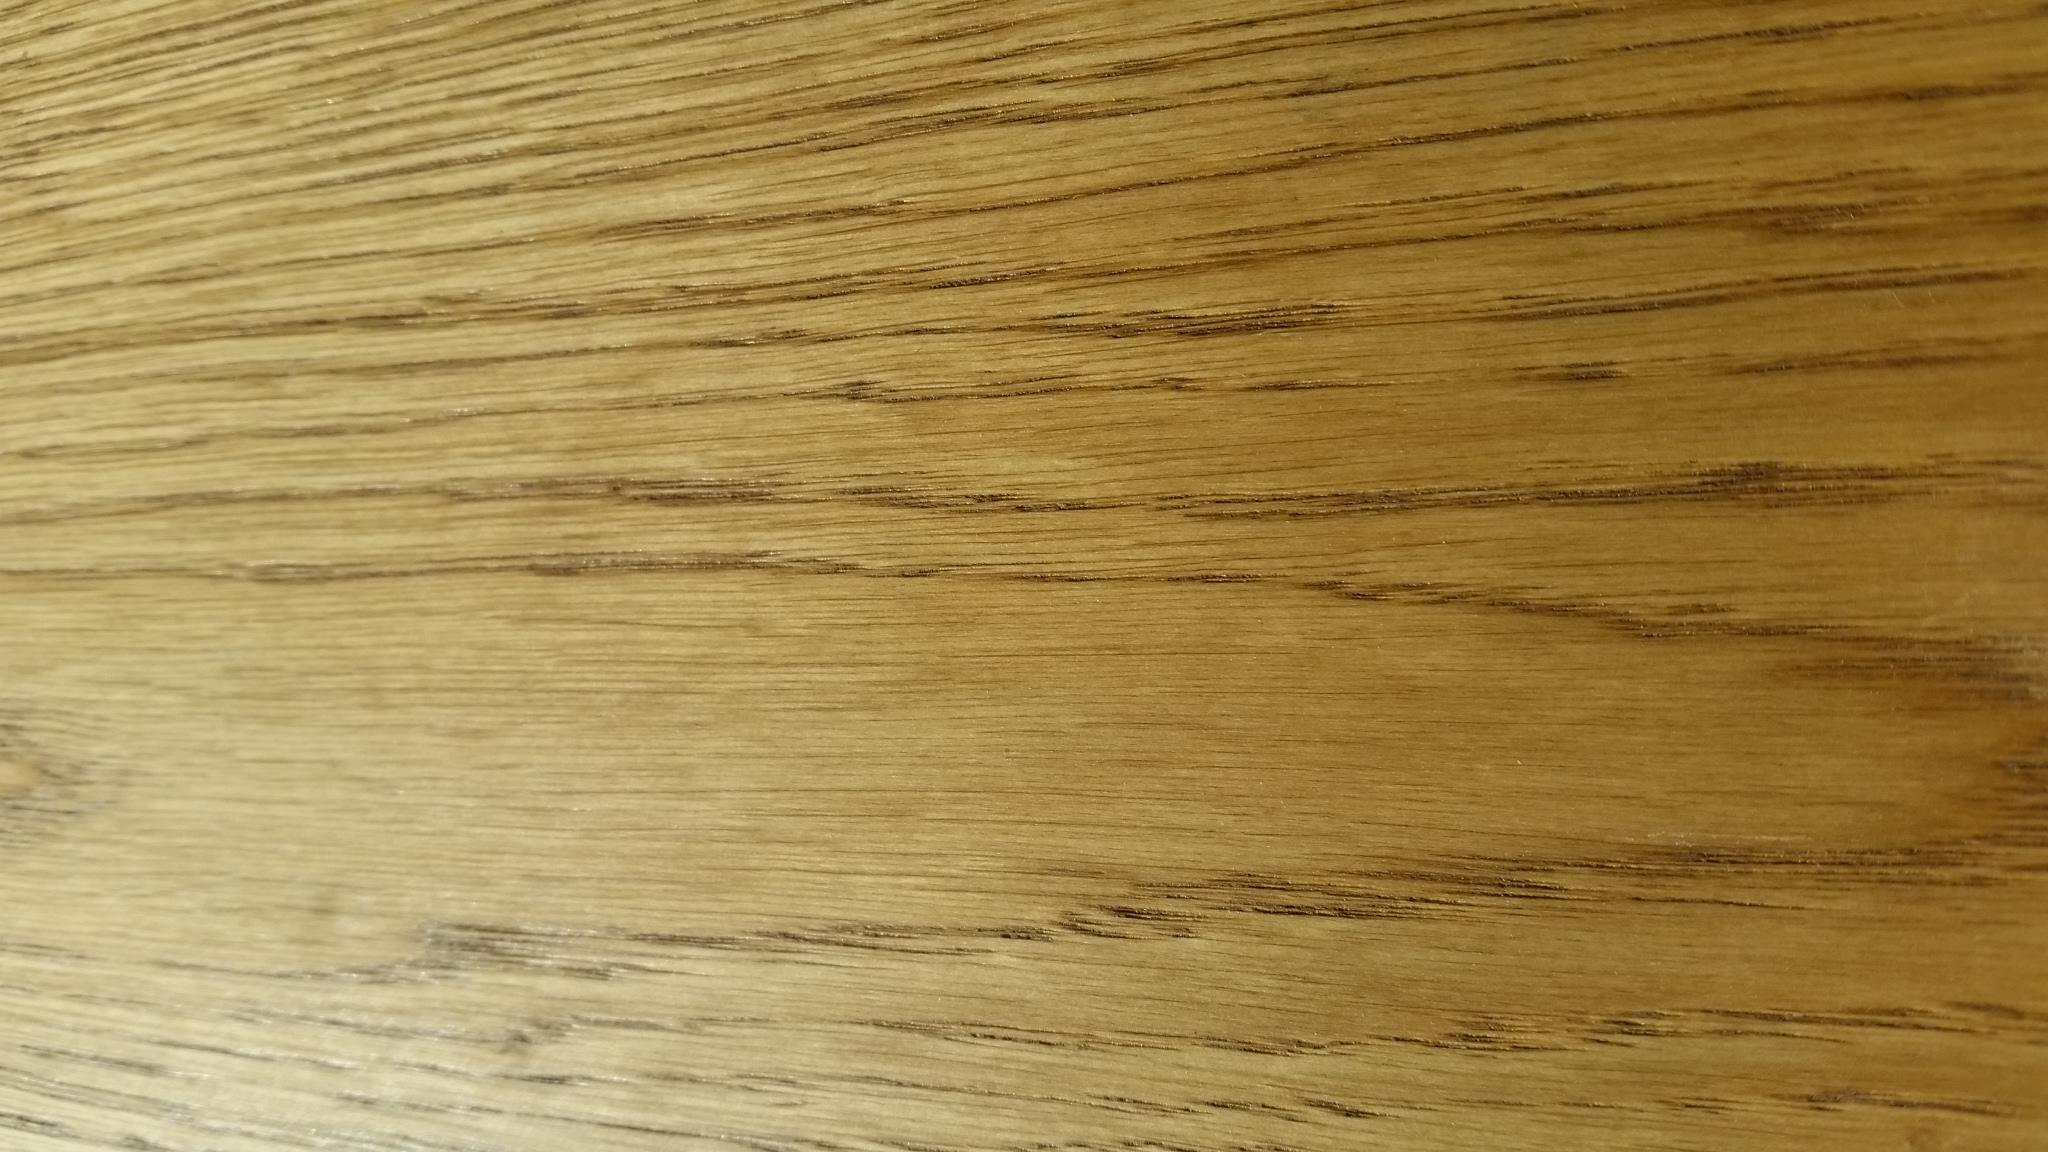 Saicos õlitoonid | 3081 Pähkel transparentsile Walnut transparentsmooth